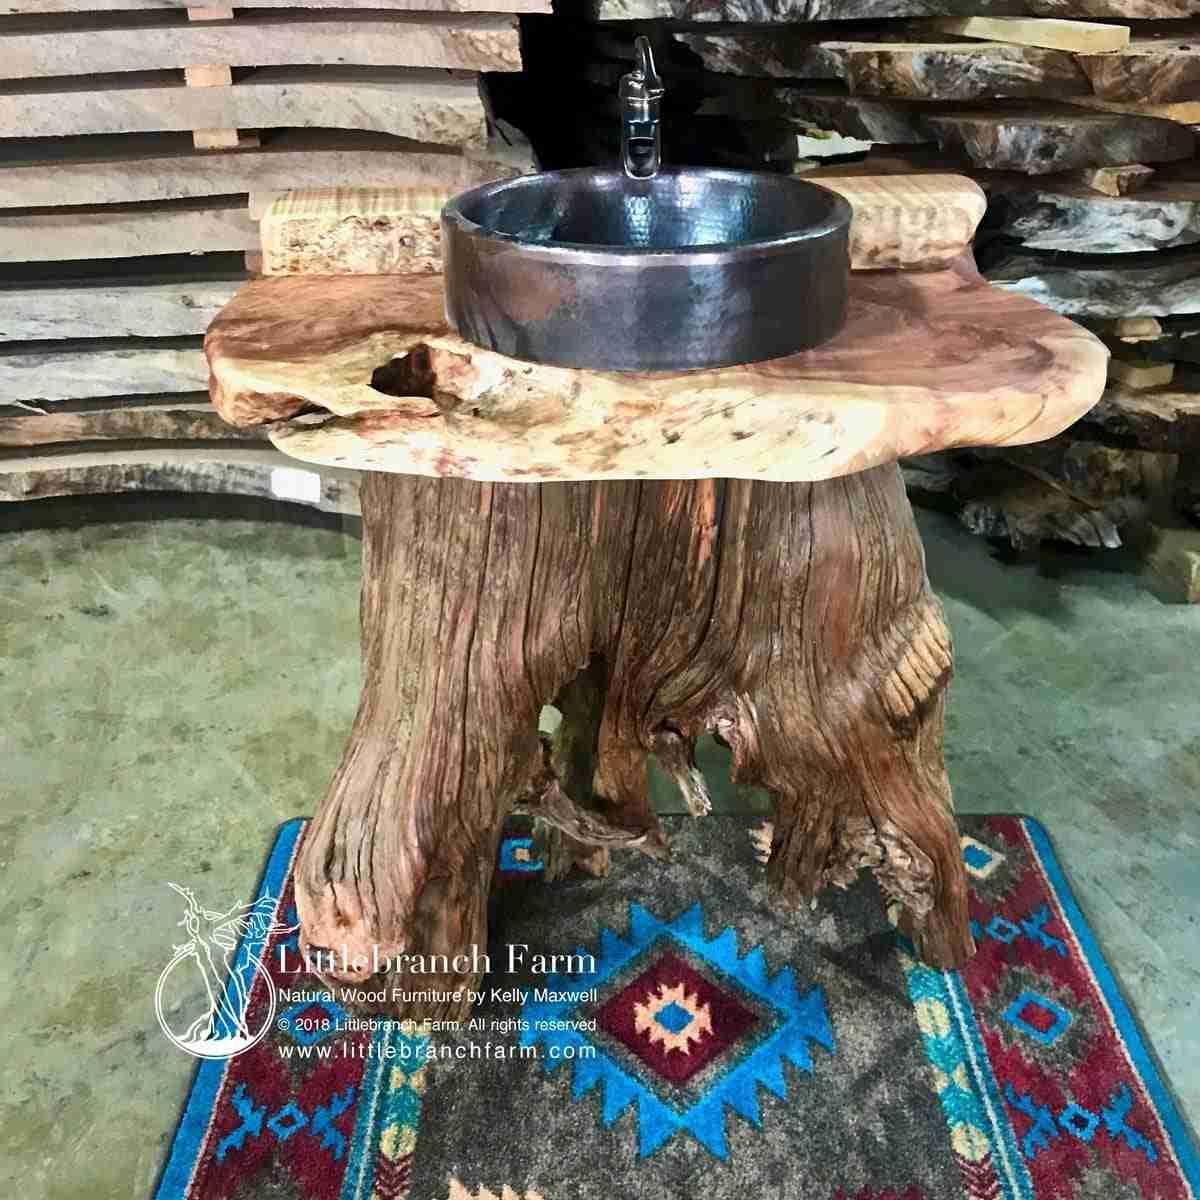 Custom Rustic Bathroom Vanity Made From Tree Stump